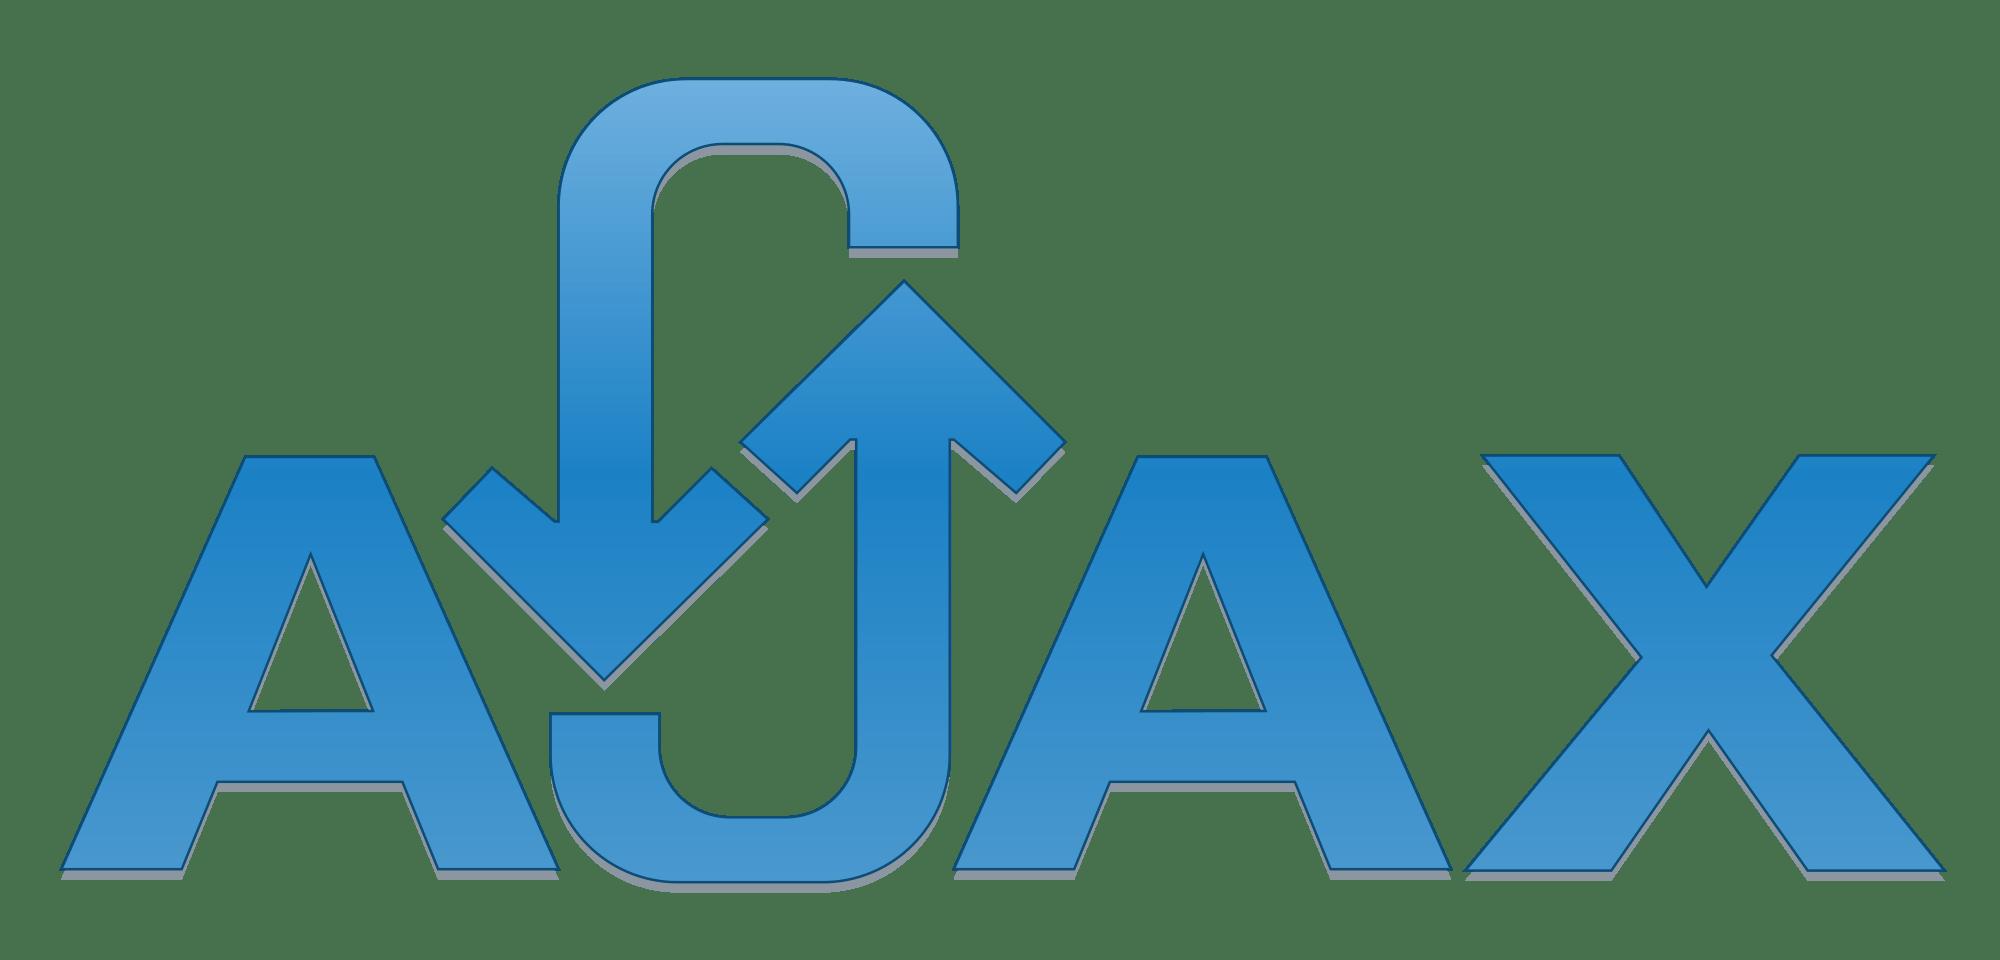 AJAX; a part of VISION programming tool